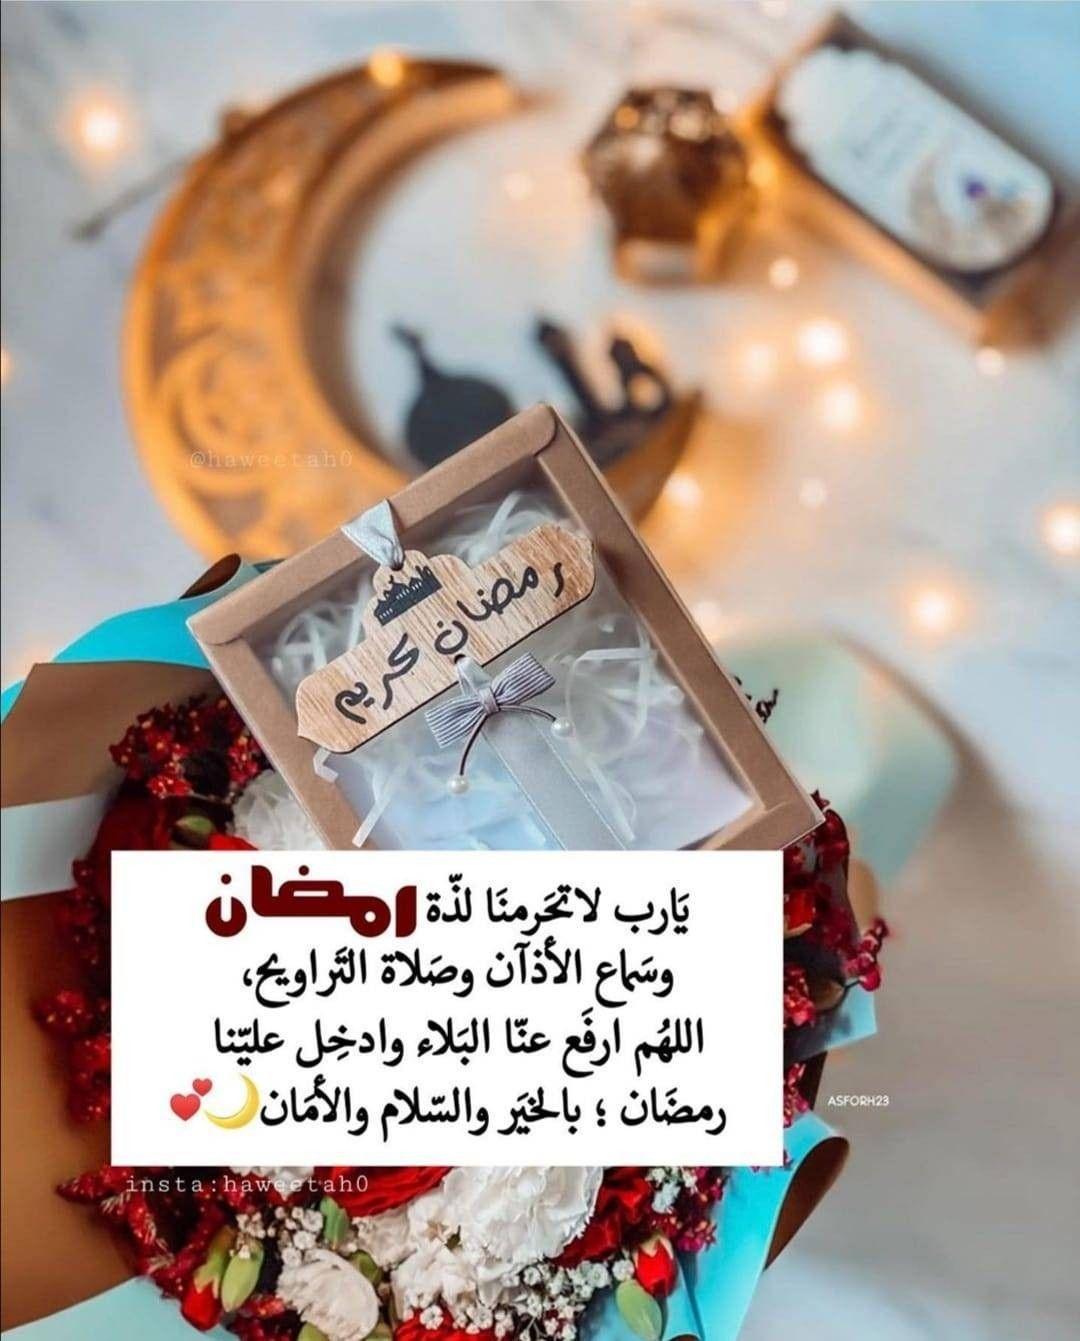 Pin By Soso Siham Al Wahaibi On دعاء In 2021 Ramadan Quotes Ramadan Day Ramadan